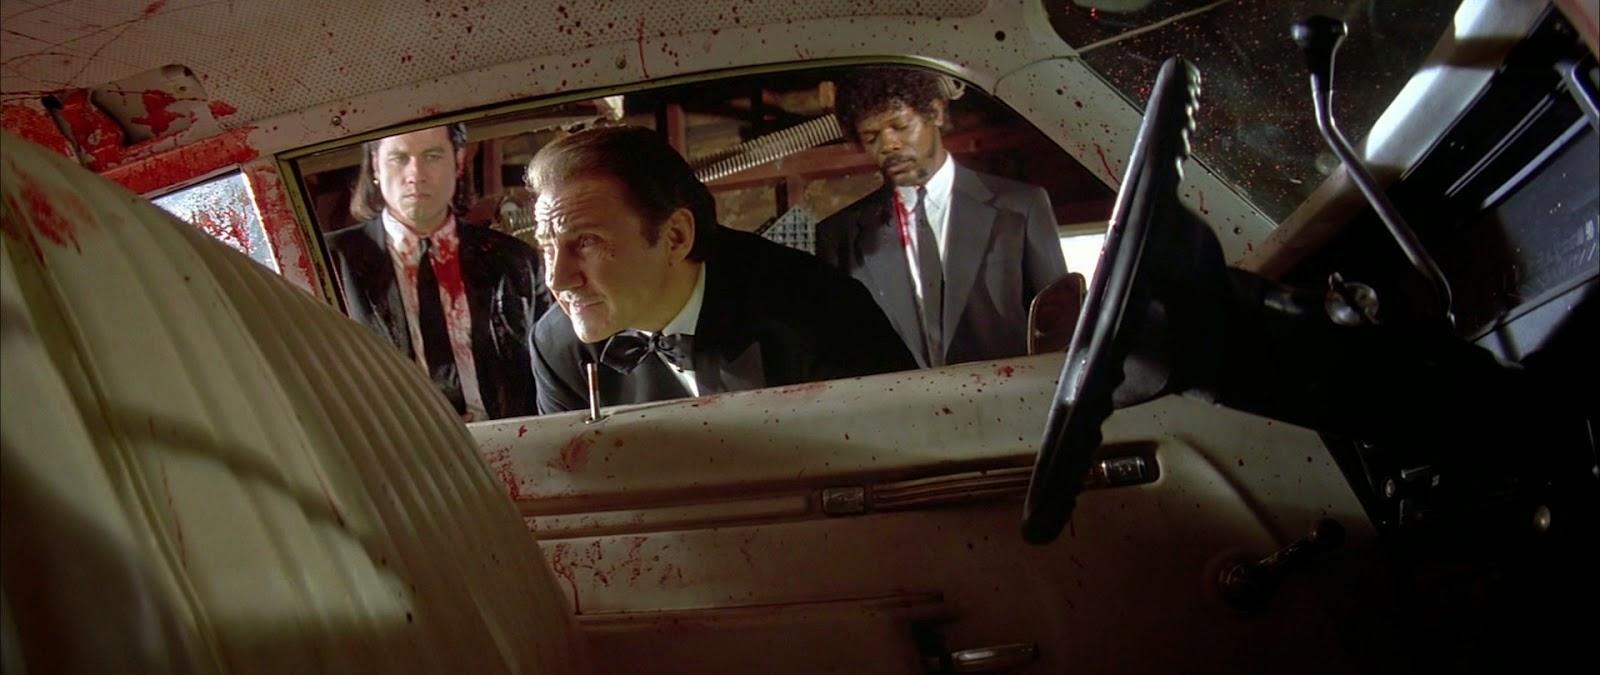 Pulp Fiction - historky z podsvětí (režie Quentin Tarantino)